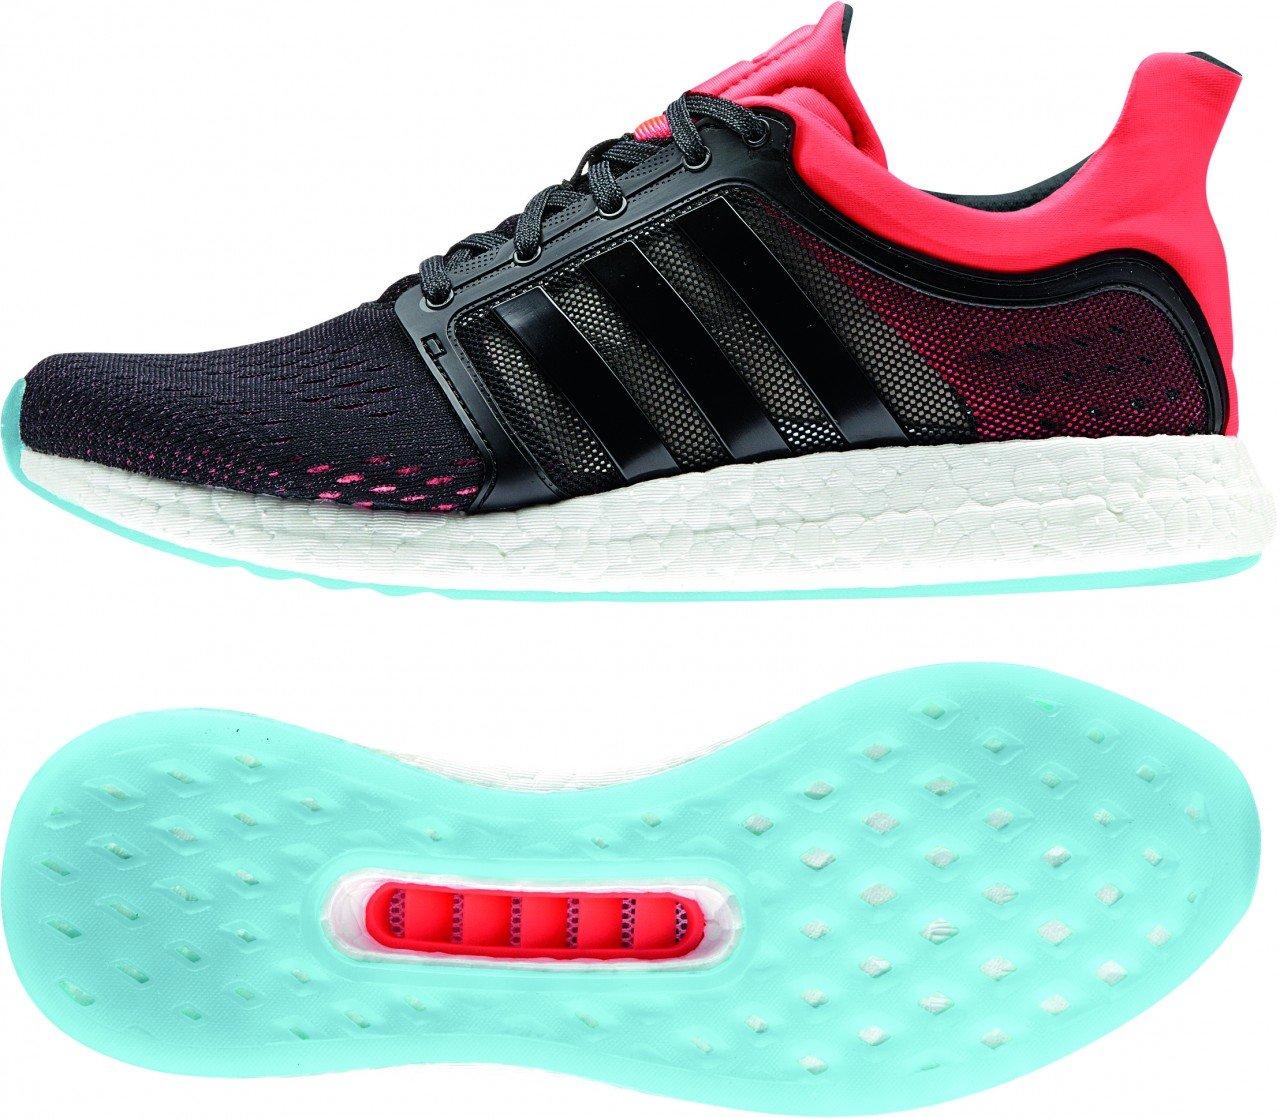 Adidas Adidas Adidas Climachill Rocket Boost Damen Laufschuh schwarz 973387